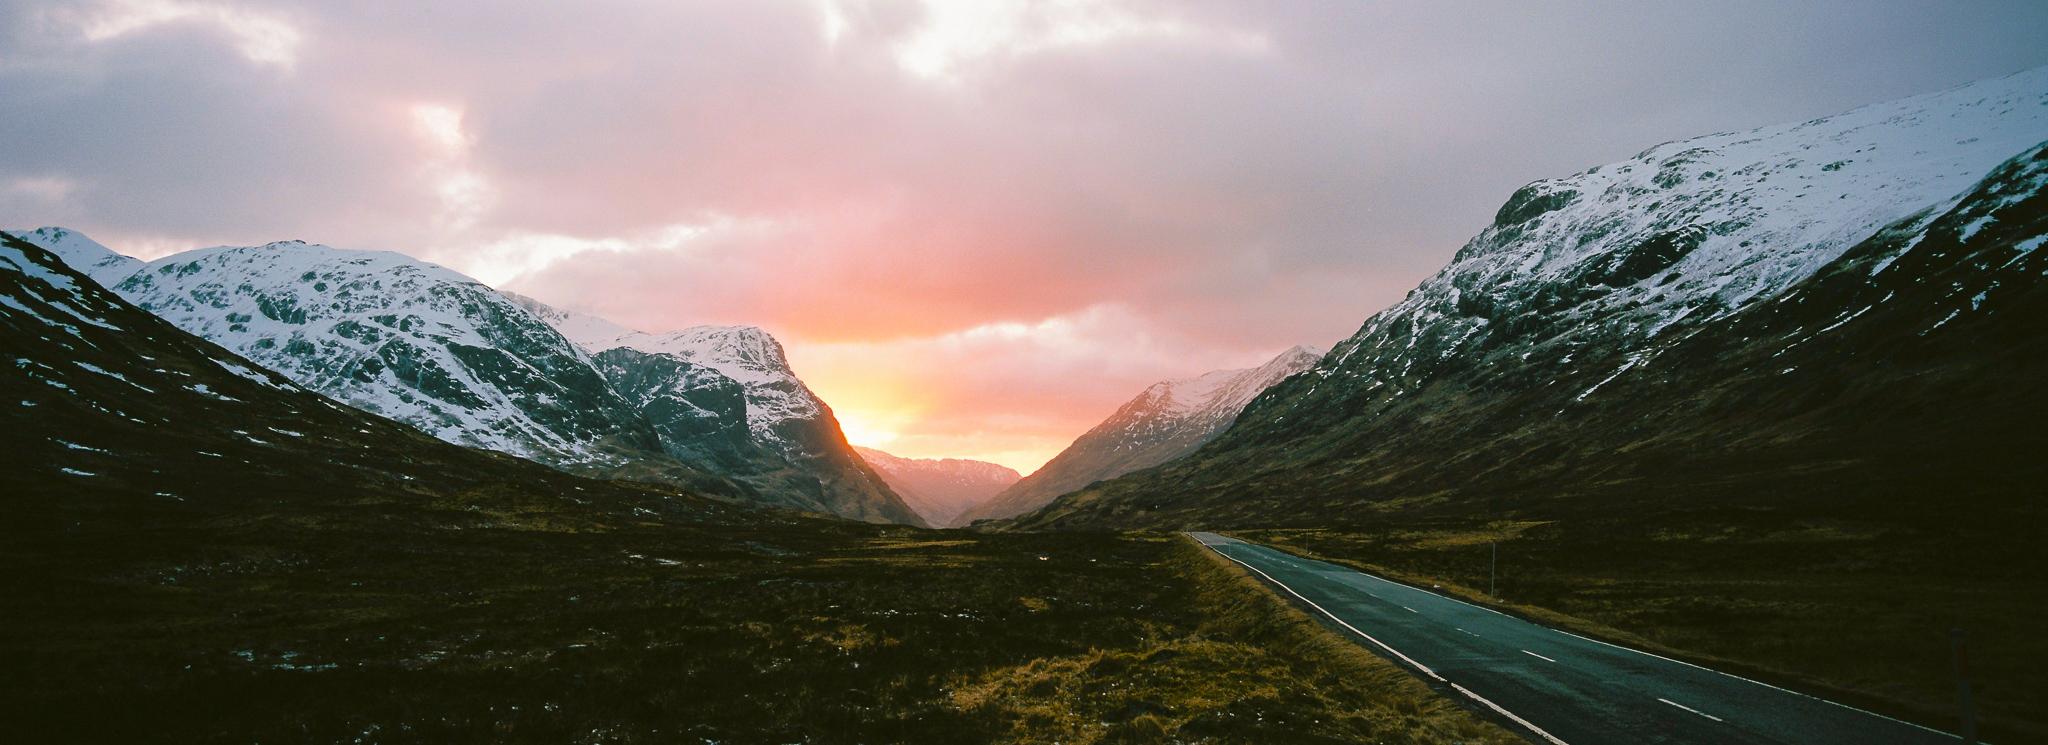 Glencoe, Scotland. Hasselblad Xpan, 45mm. Kodak Ektar 100.